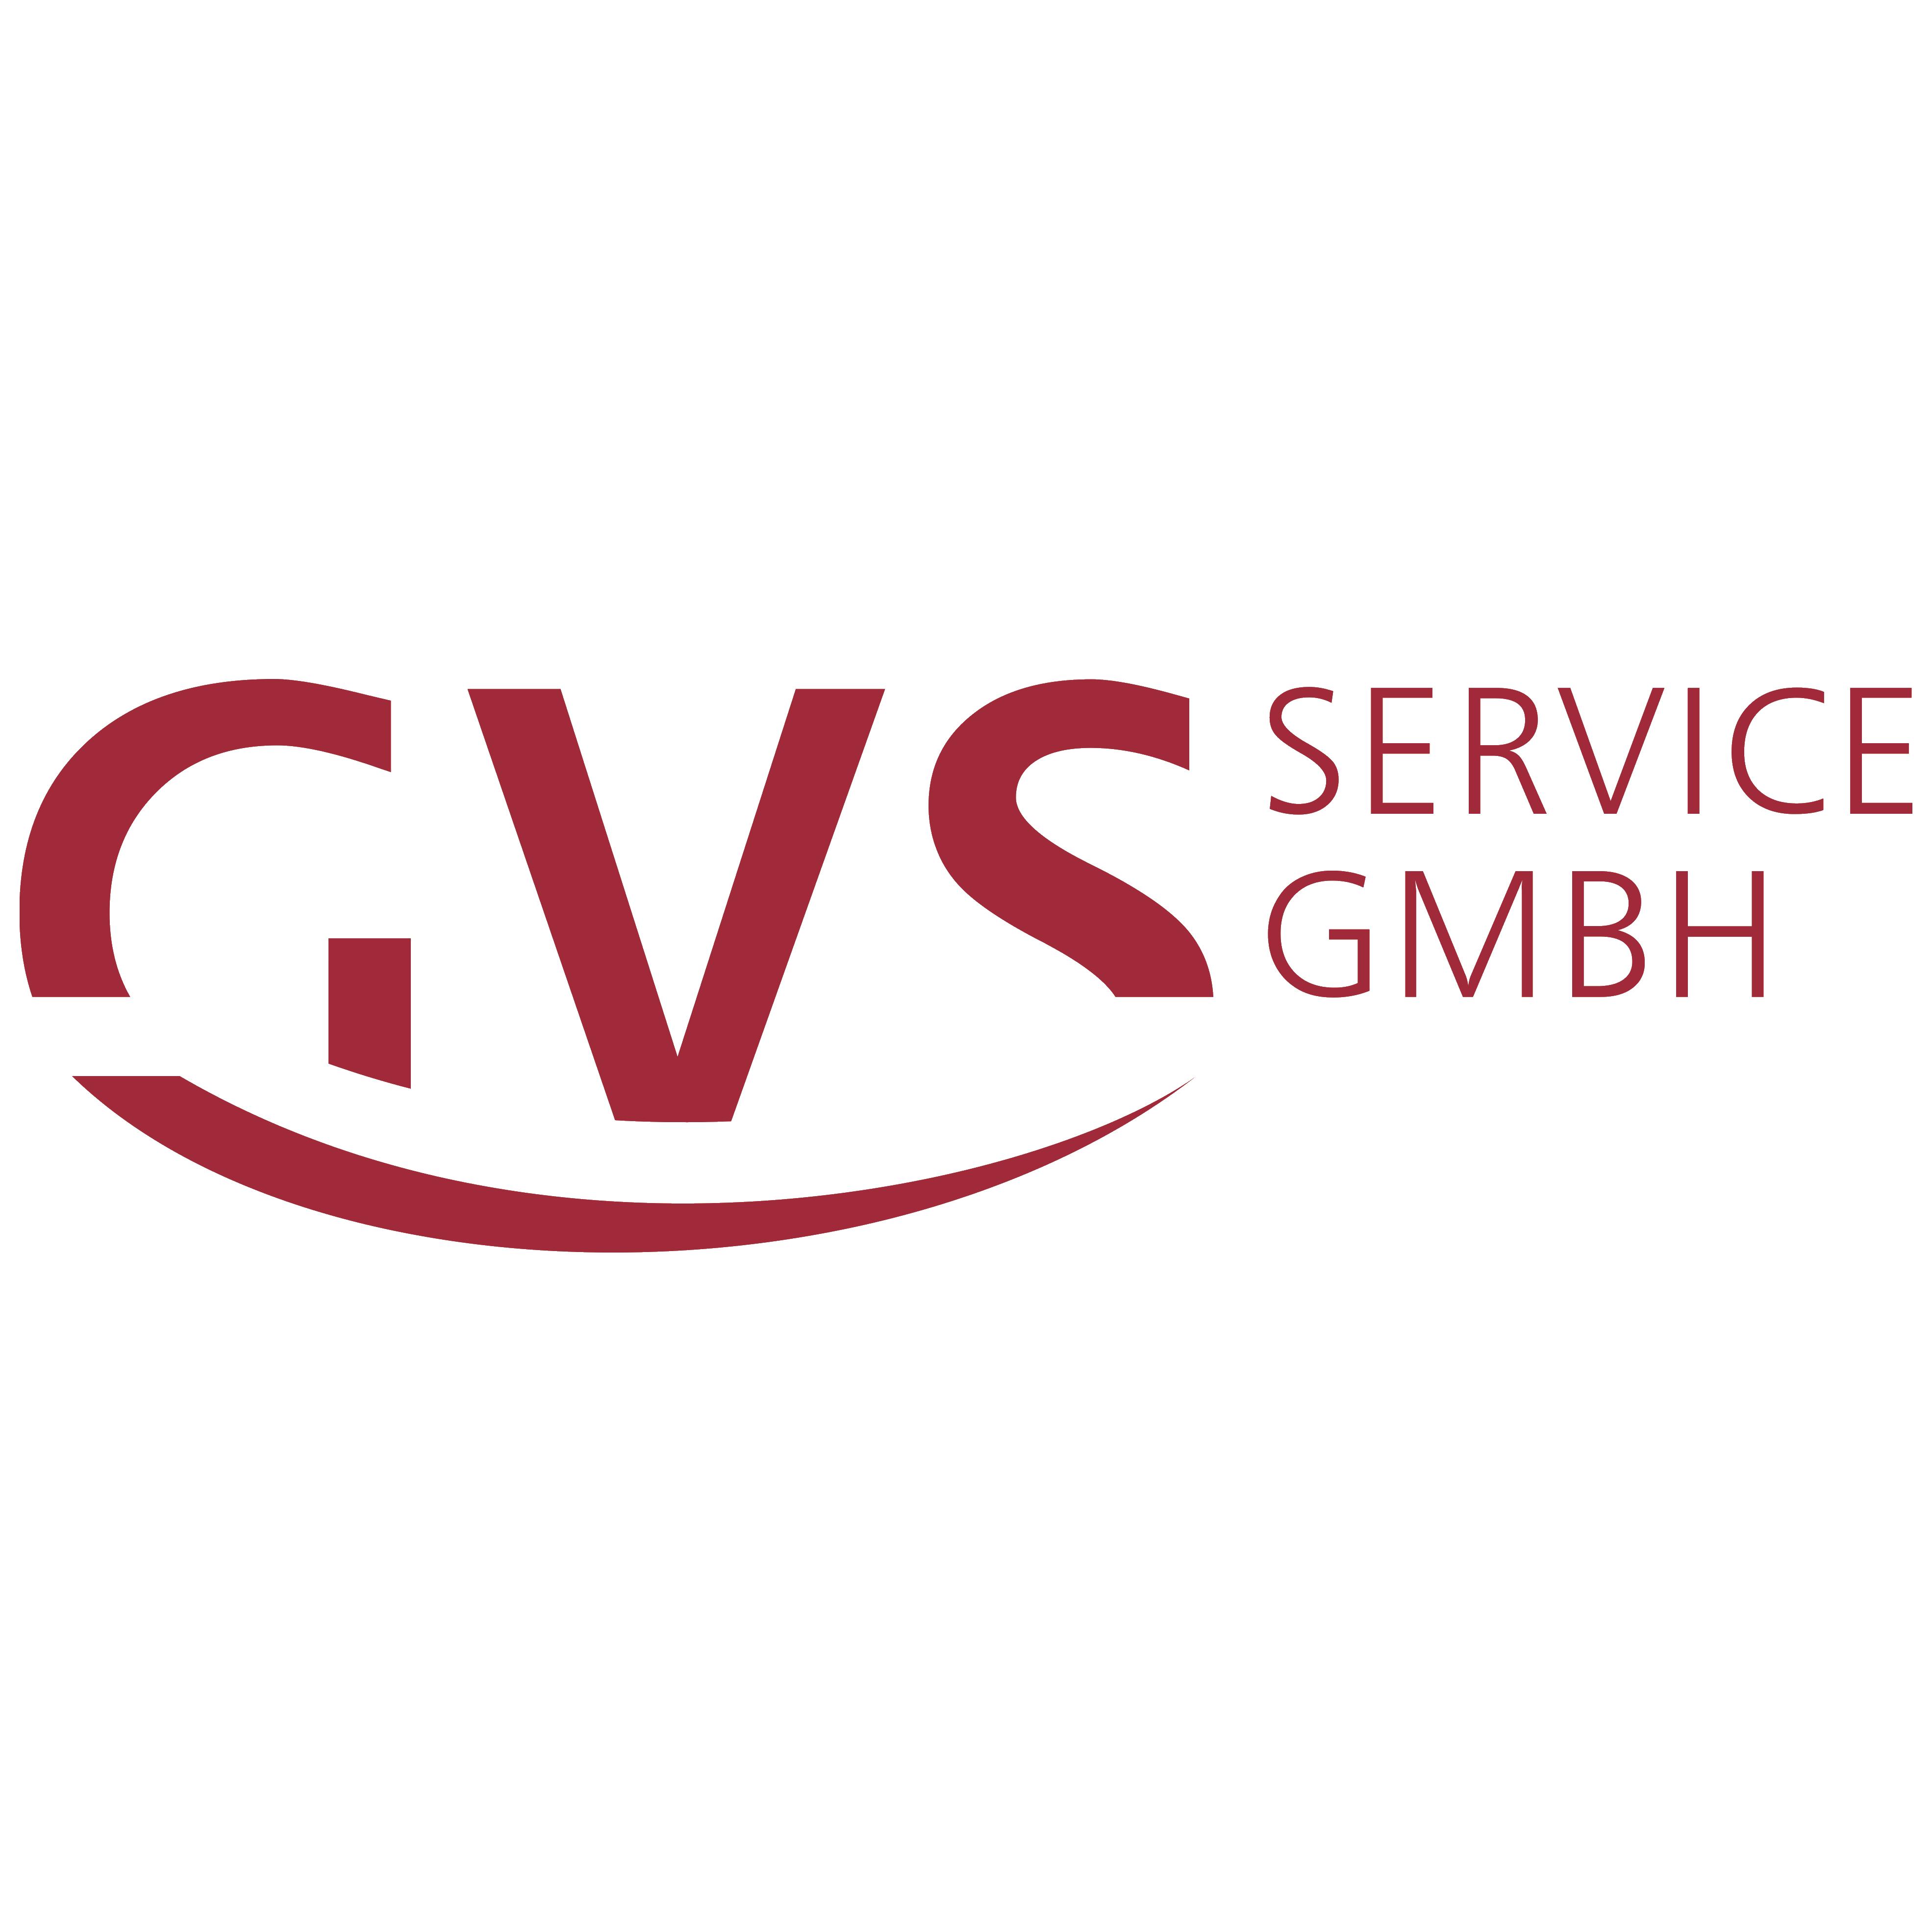 GVS_Service-GmbH_Logo_transparent.png